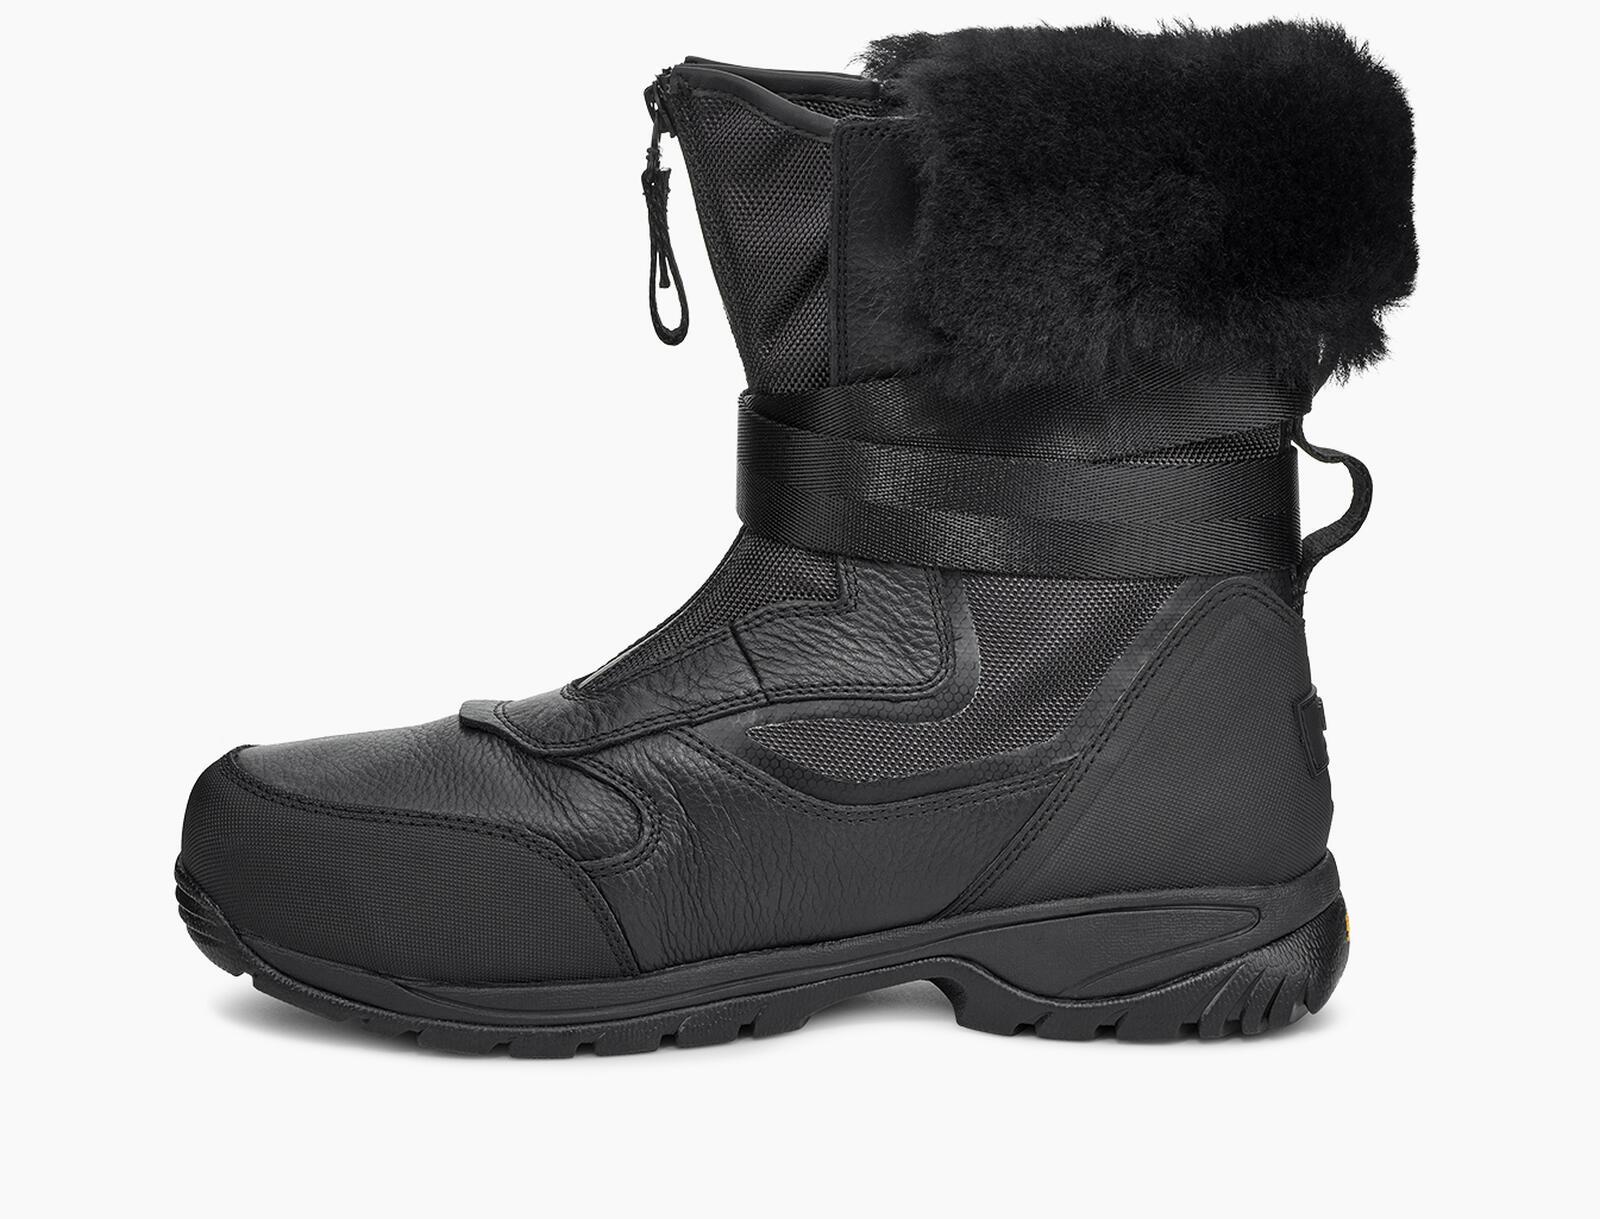 Tahoe Warme Boots